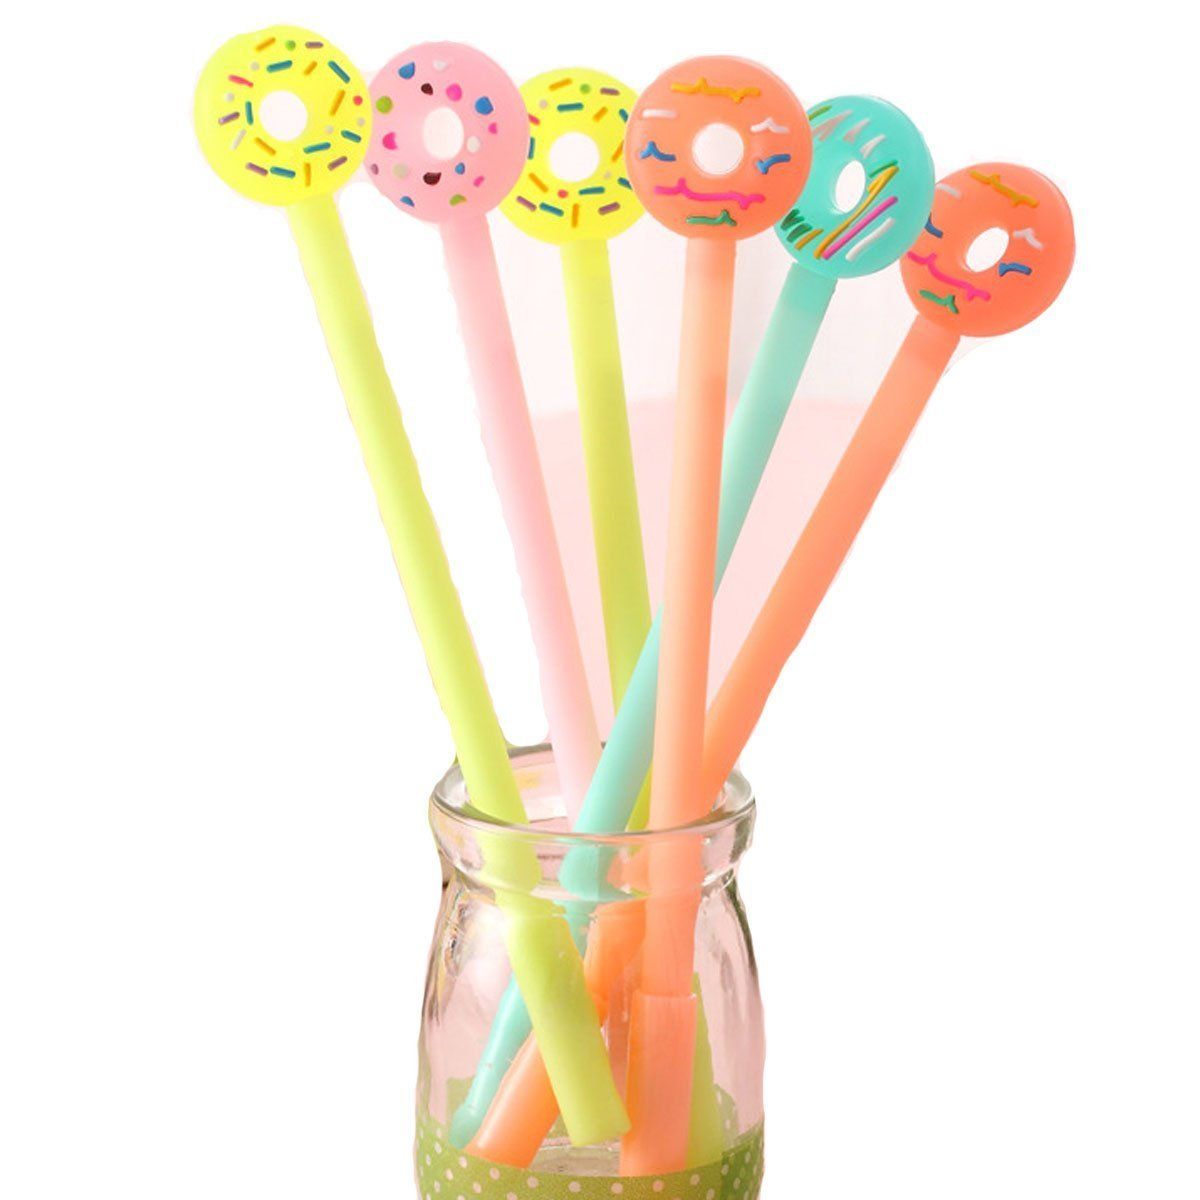 WIN-MARKET Fashion Cute Cool Lollipop Candy Color Cartoon Doughnuts Gel Pen Creative Cartoon Ball Pens Office School Supply Stationery (6PCS)